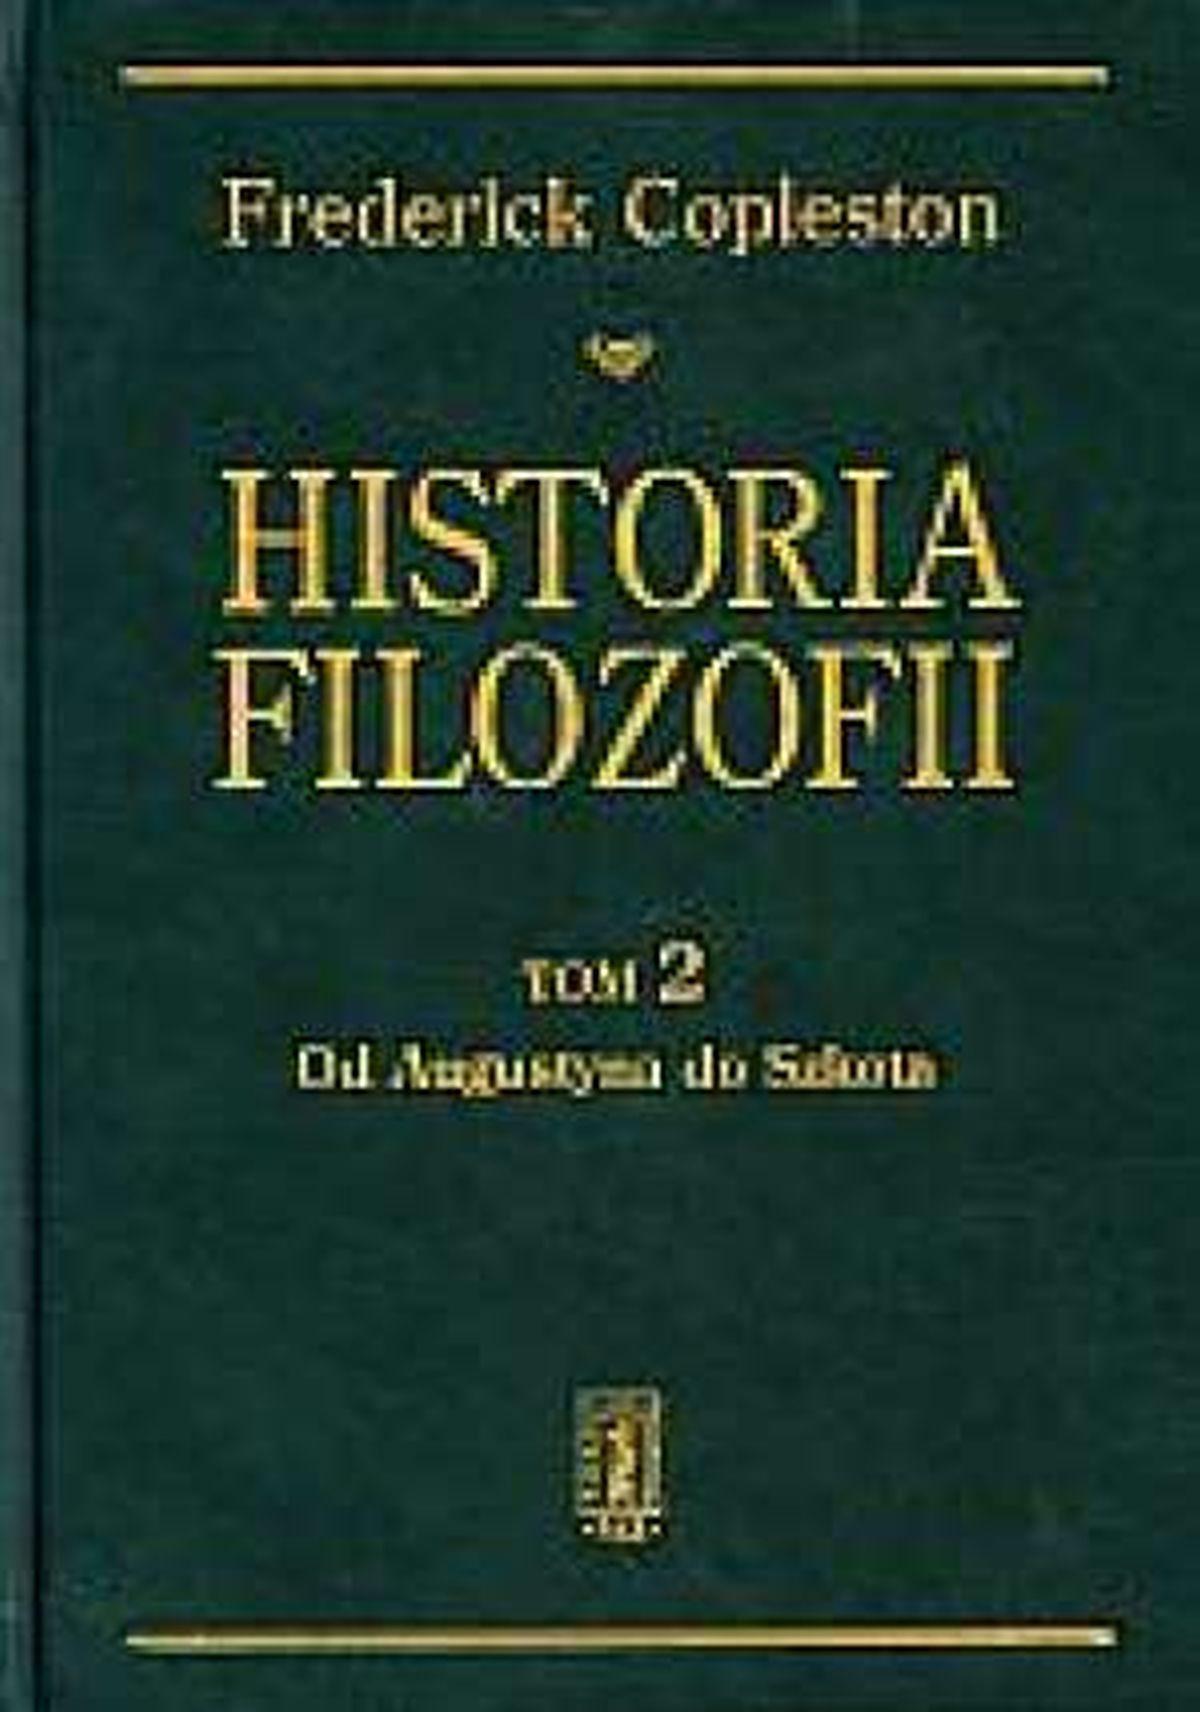 Frederick Copleston, Historia filozofii. Tom 2. Od Augustyna do Szkota